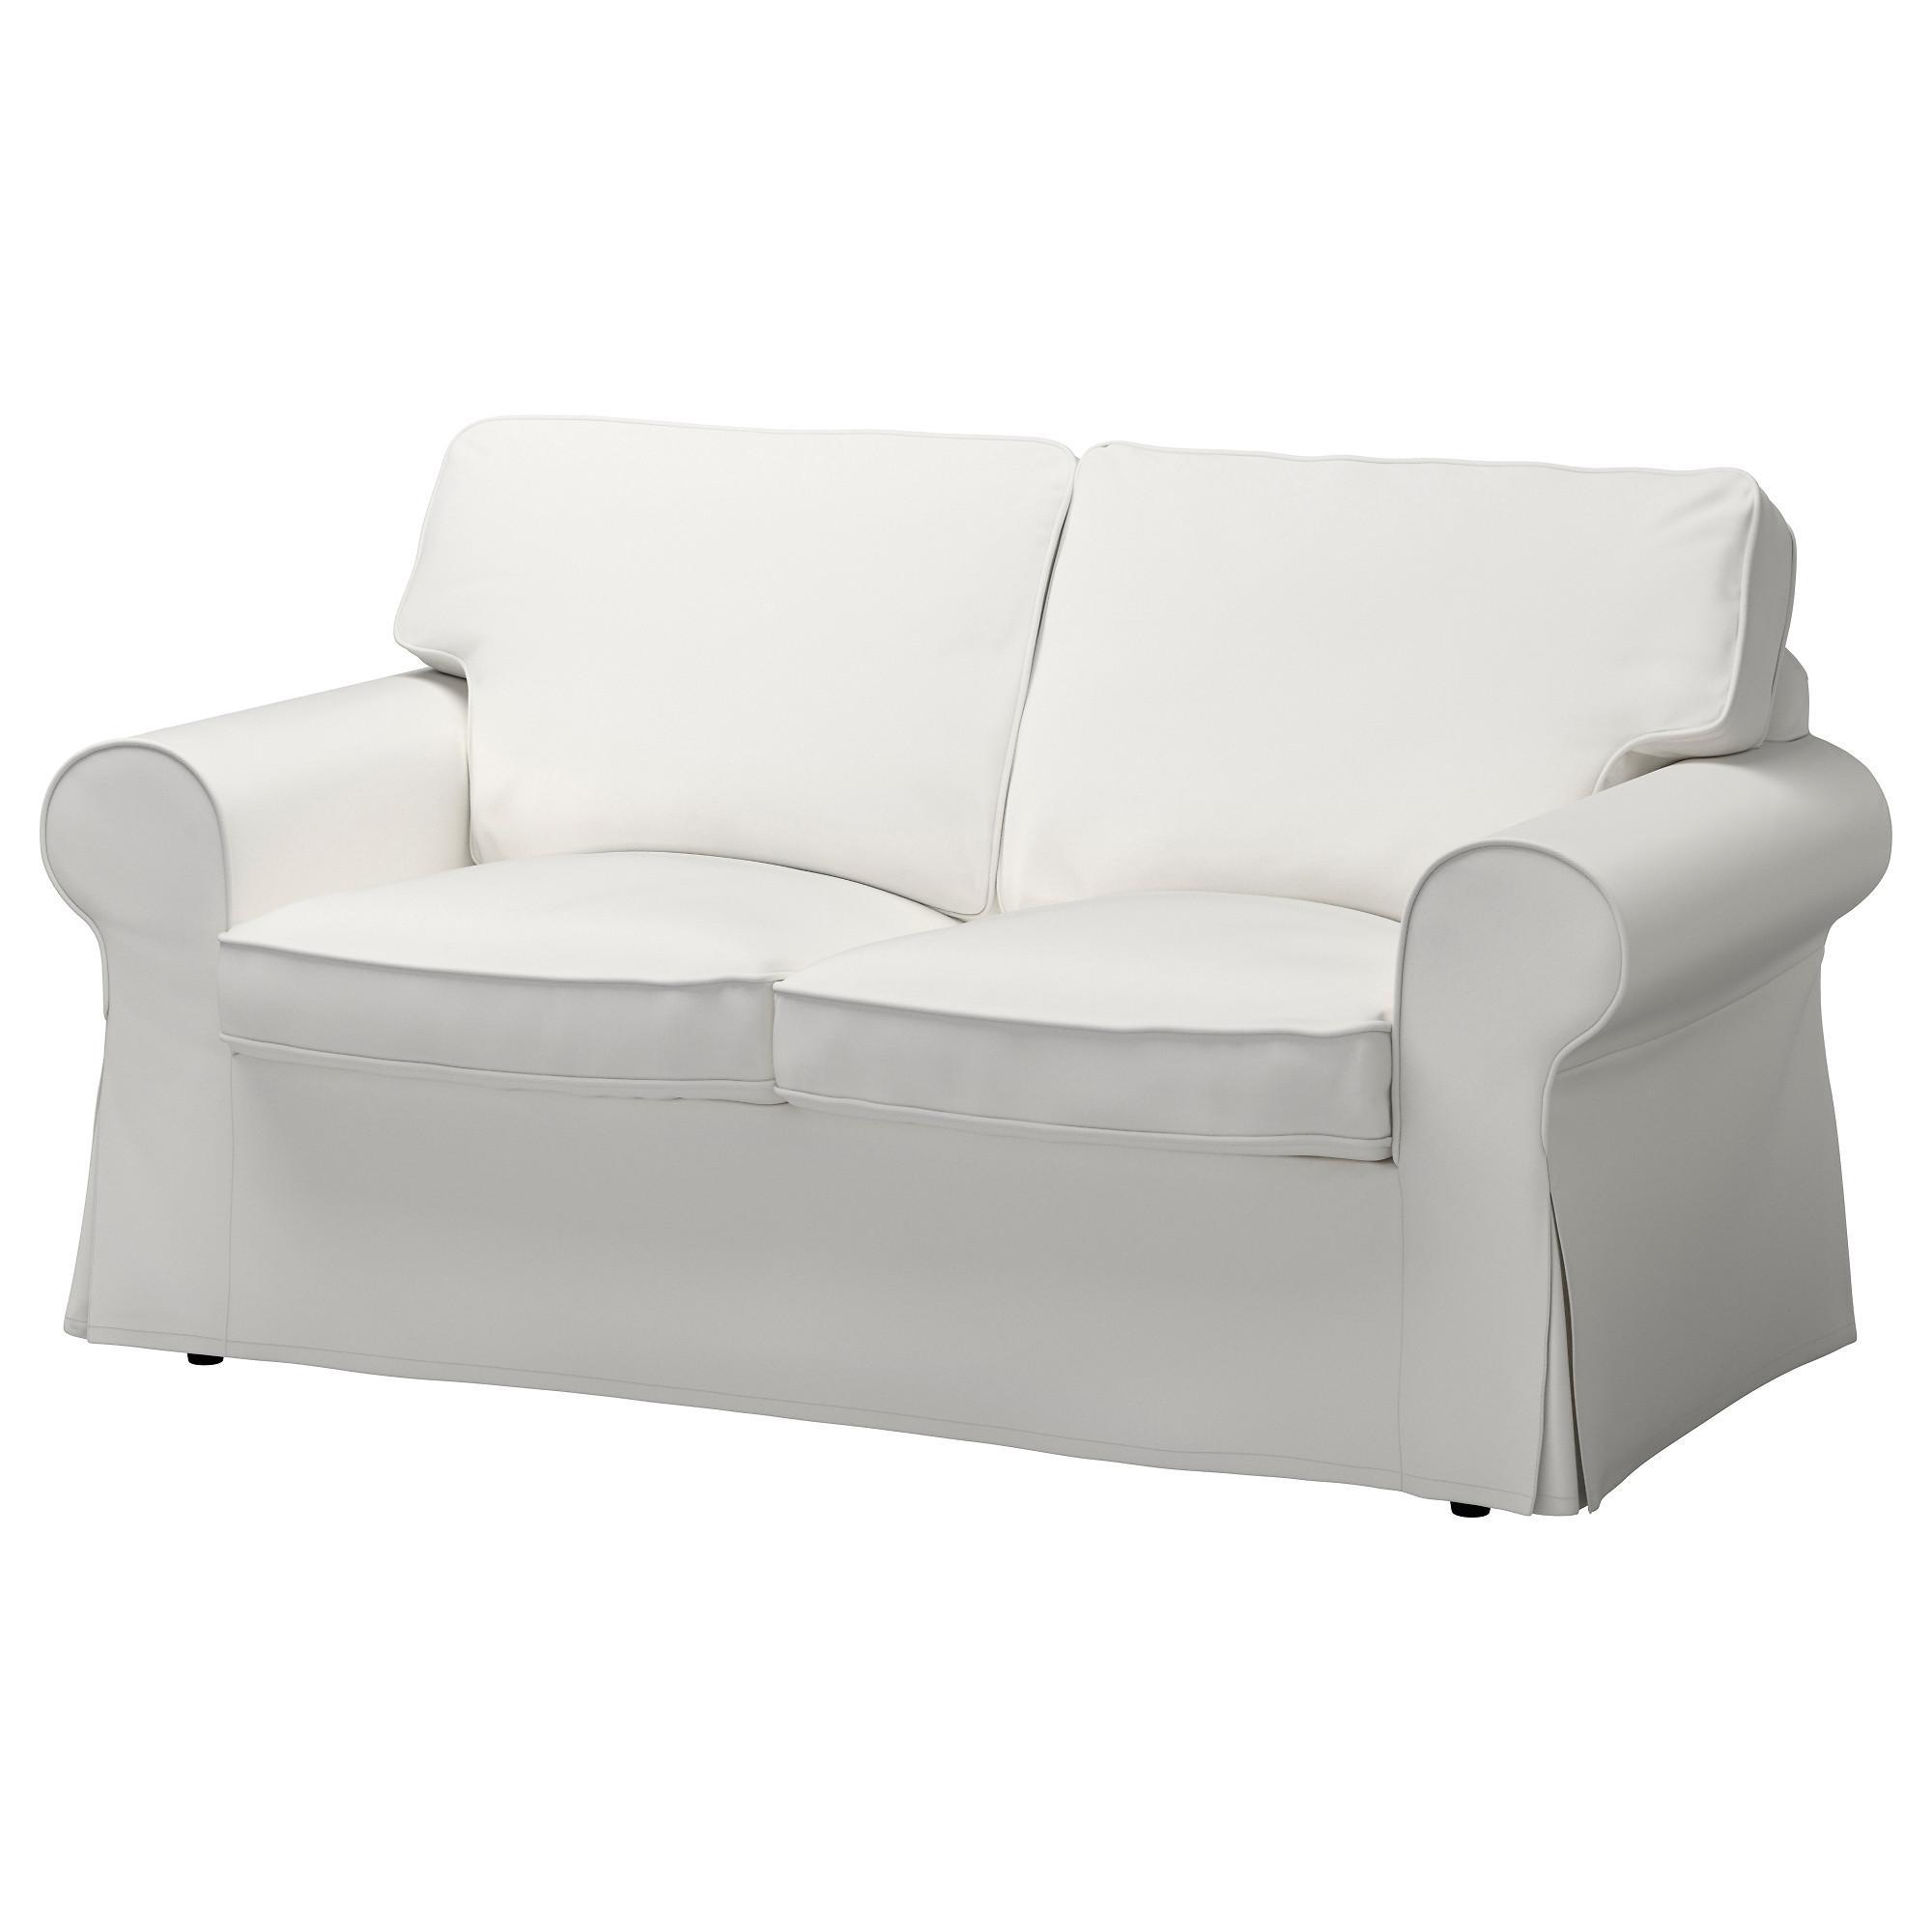 Fabric Loveseats – Ikea Pertaining To Narrow Depth Sofas (View 11 of 20)